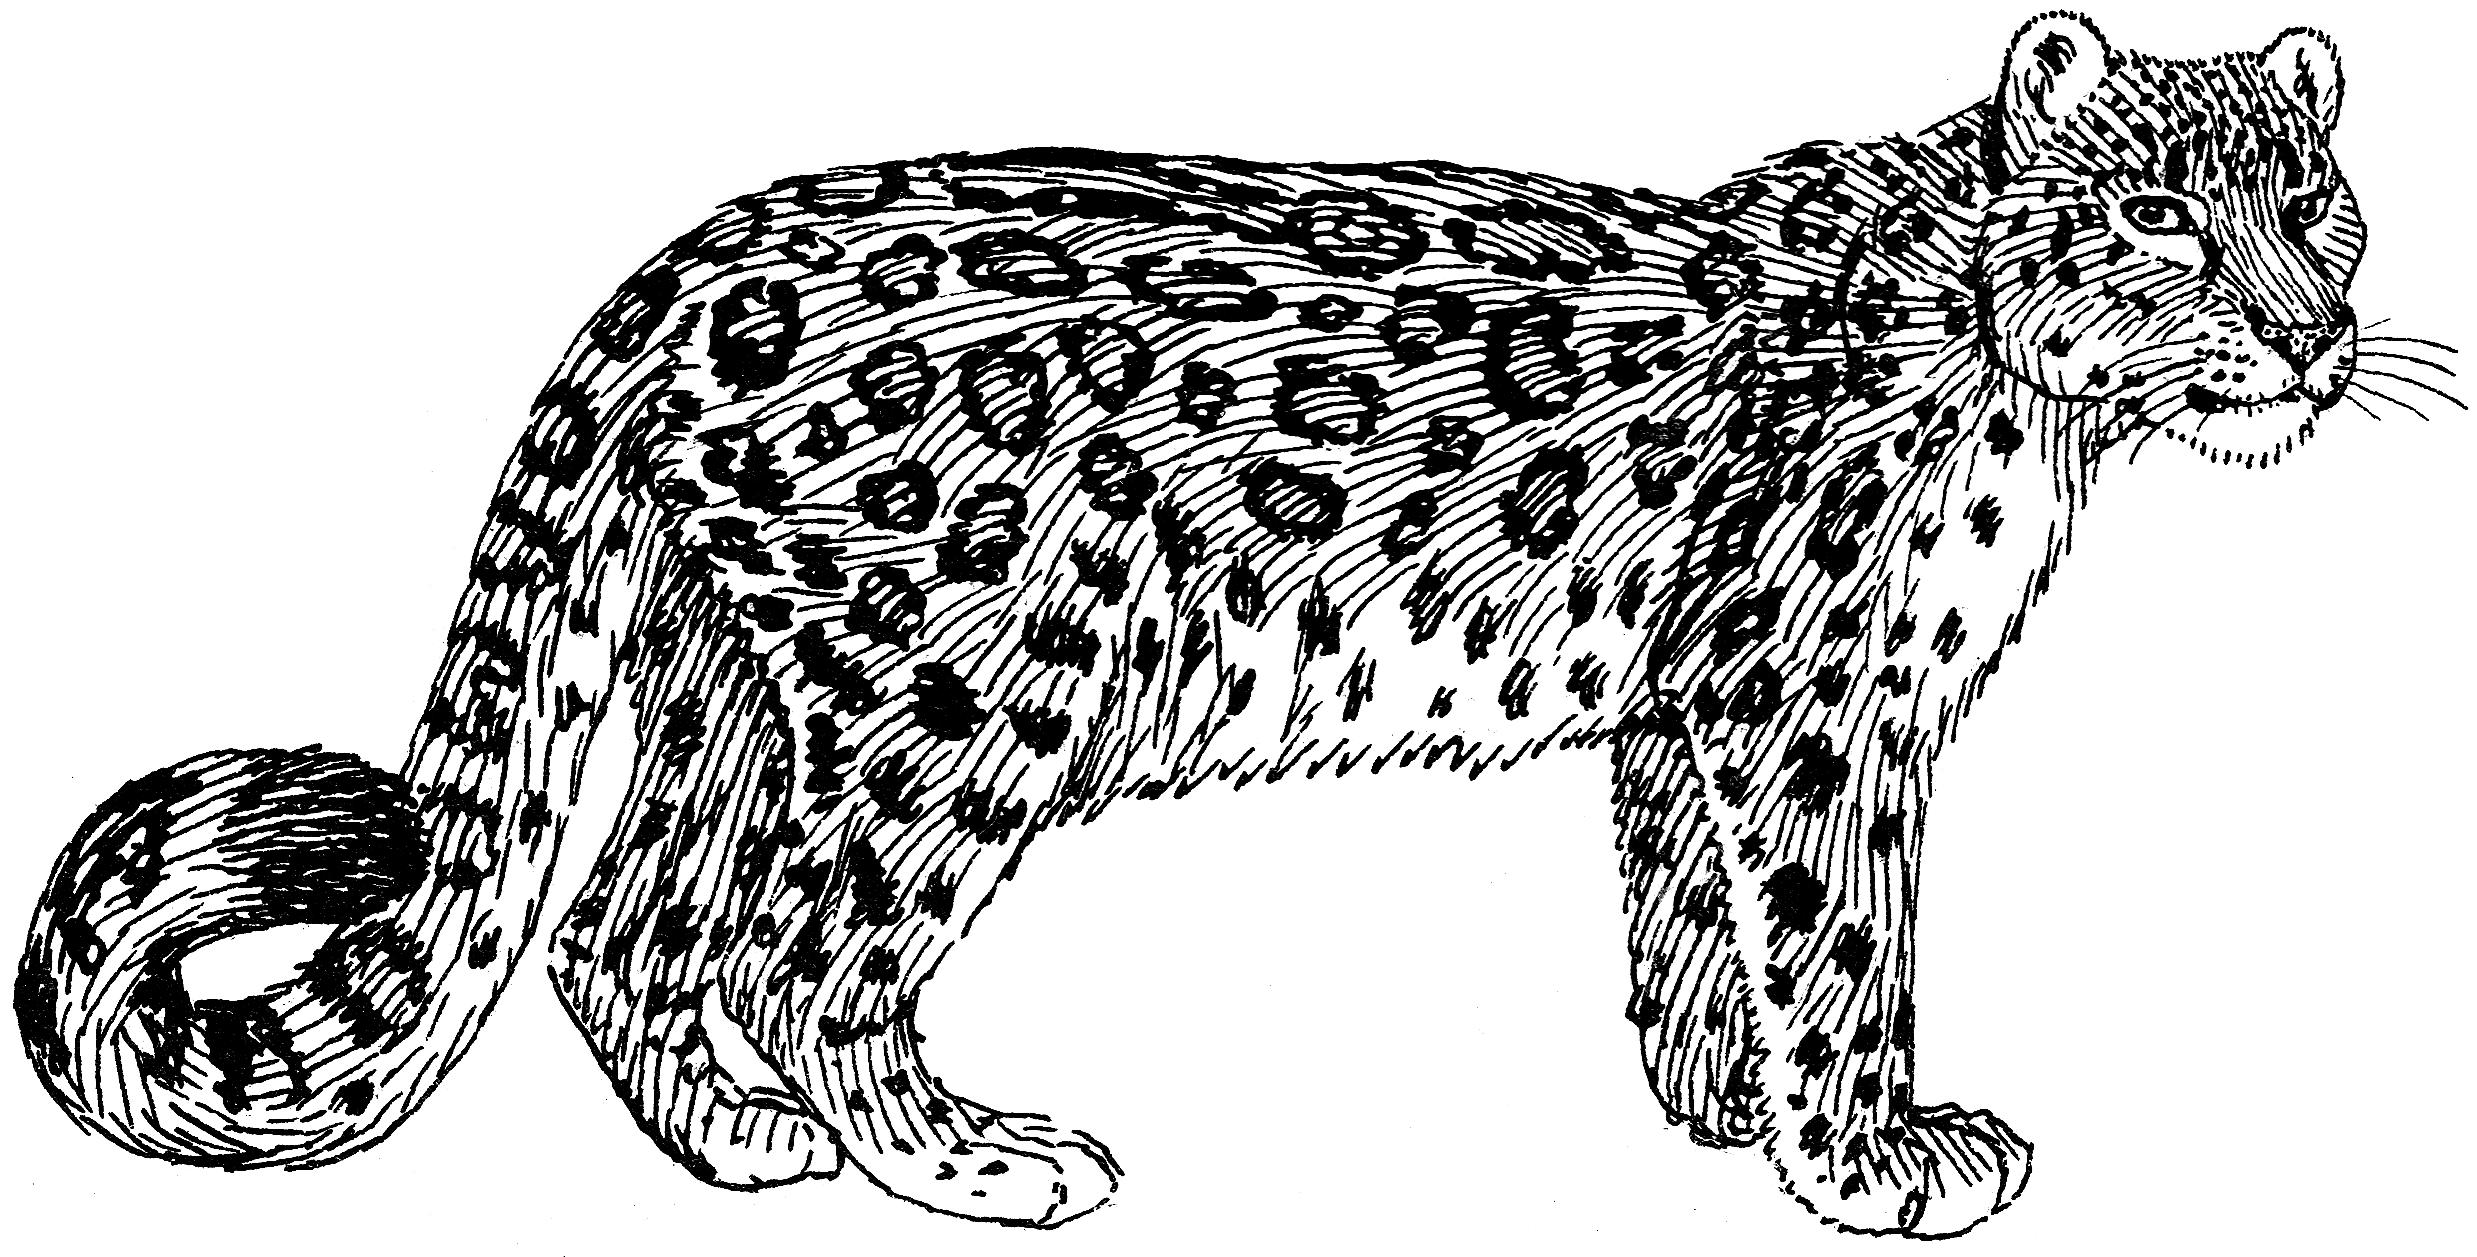 Snow Leopard Psf Png 2477 1257 Snow Leopard Drawing Snow Leopard Leopard Seal